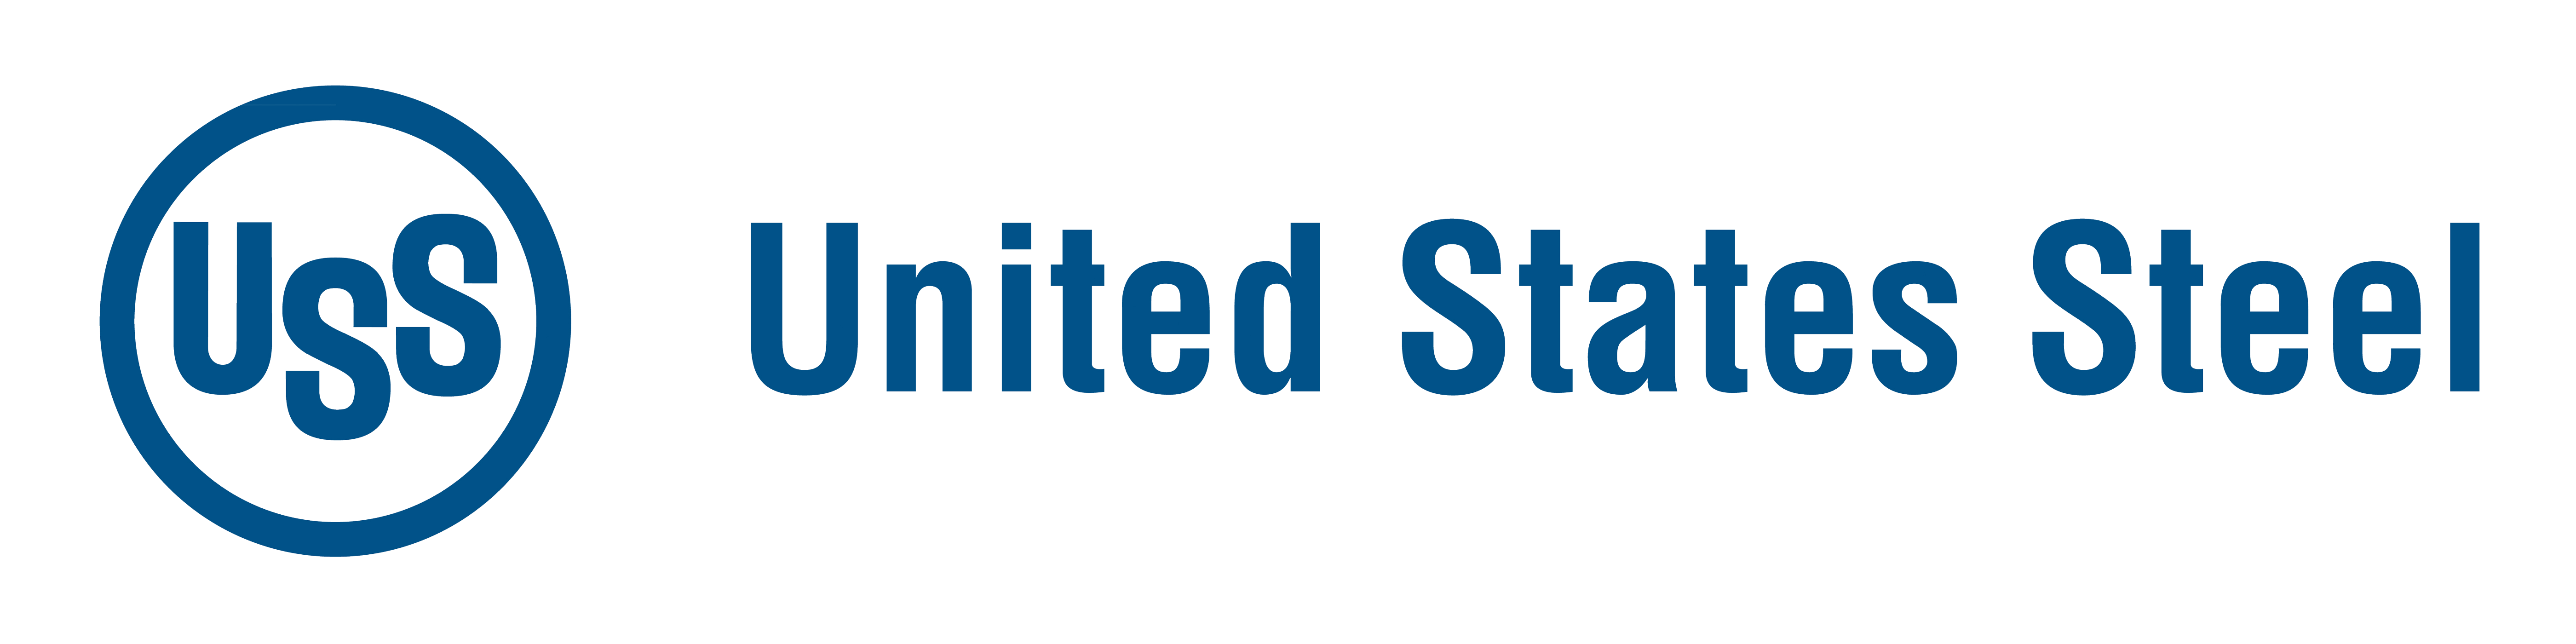 United States Steel Logo